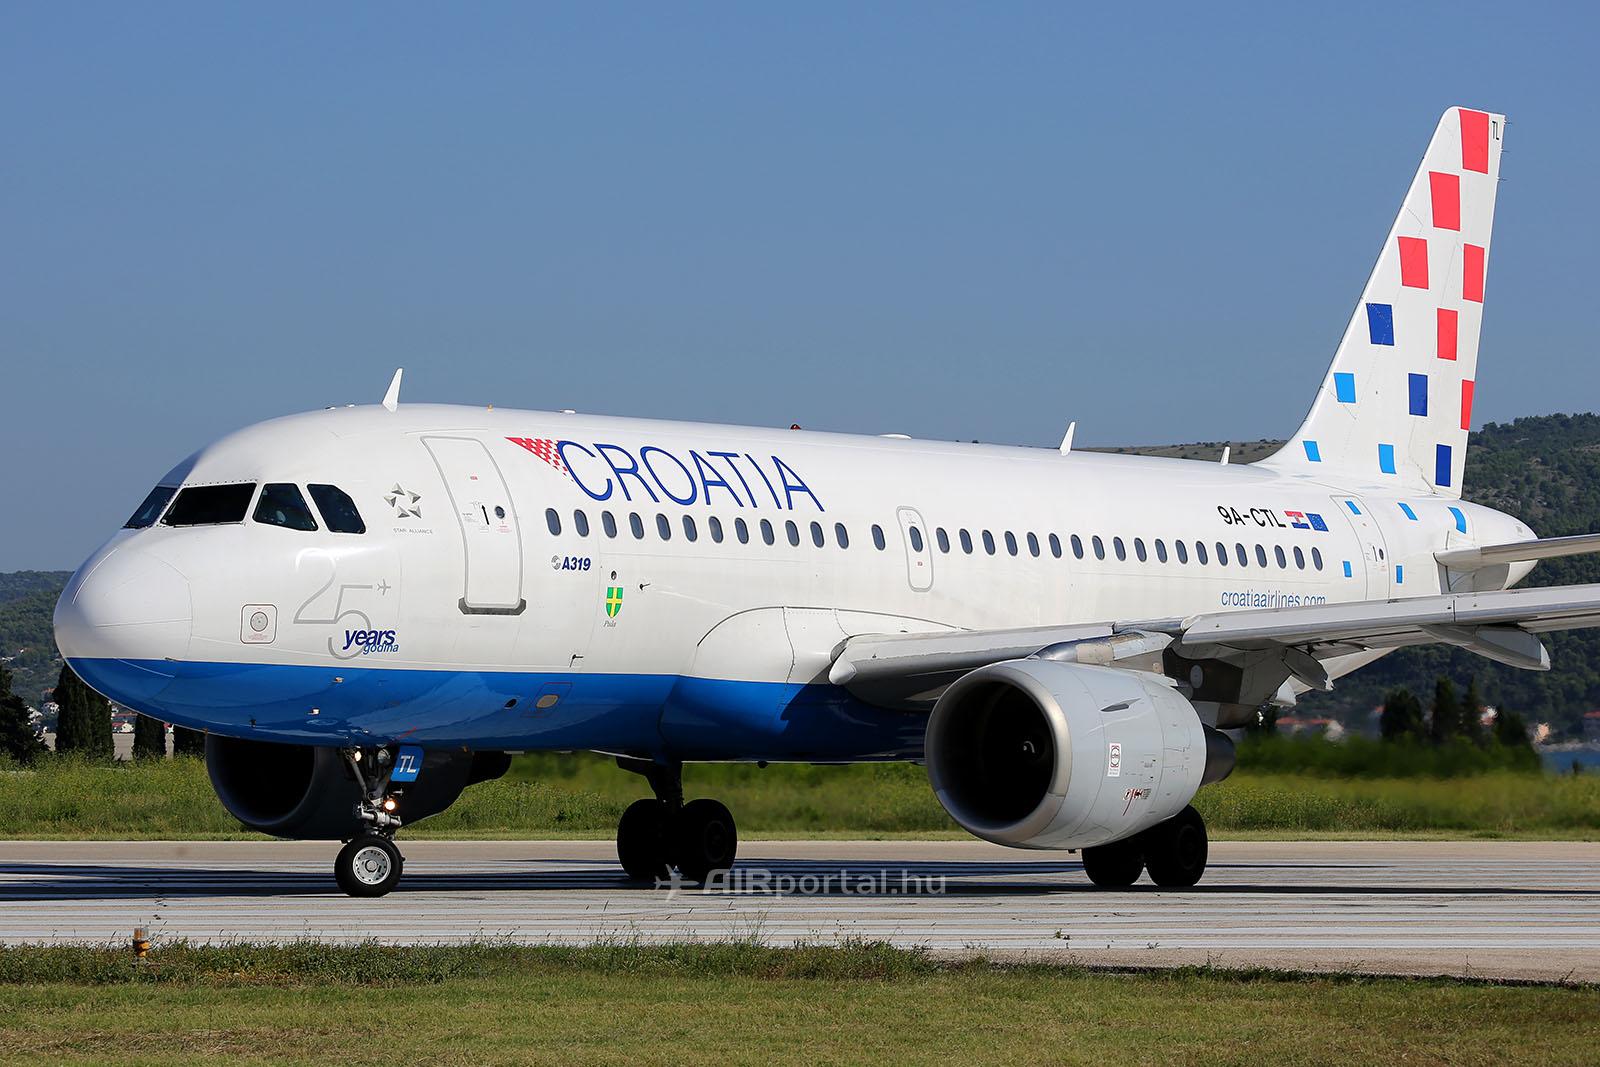 A Croatia Airlines Airbus A319-es repülőgépe. (Fotó: AIRportal.hu) | © AIRportal.hu